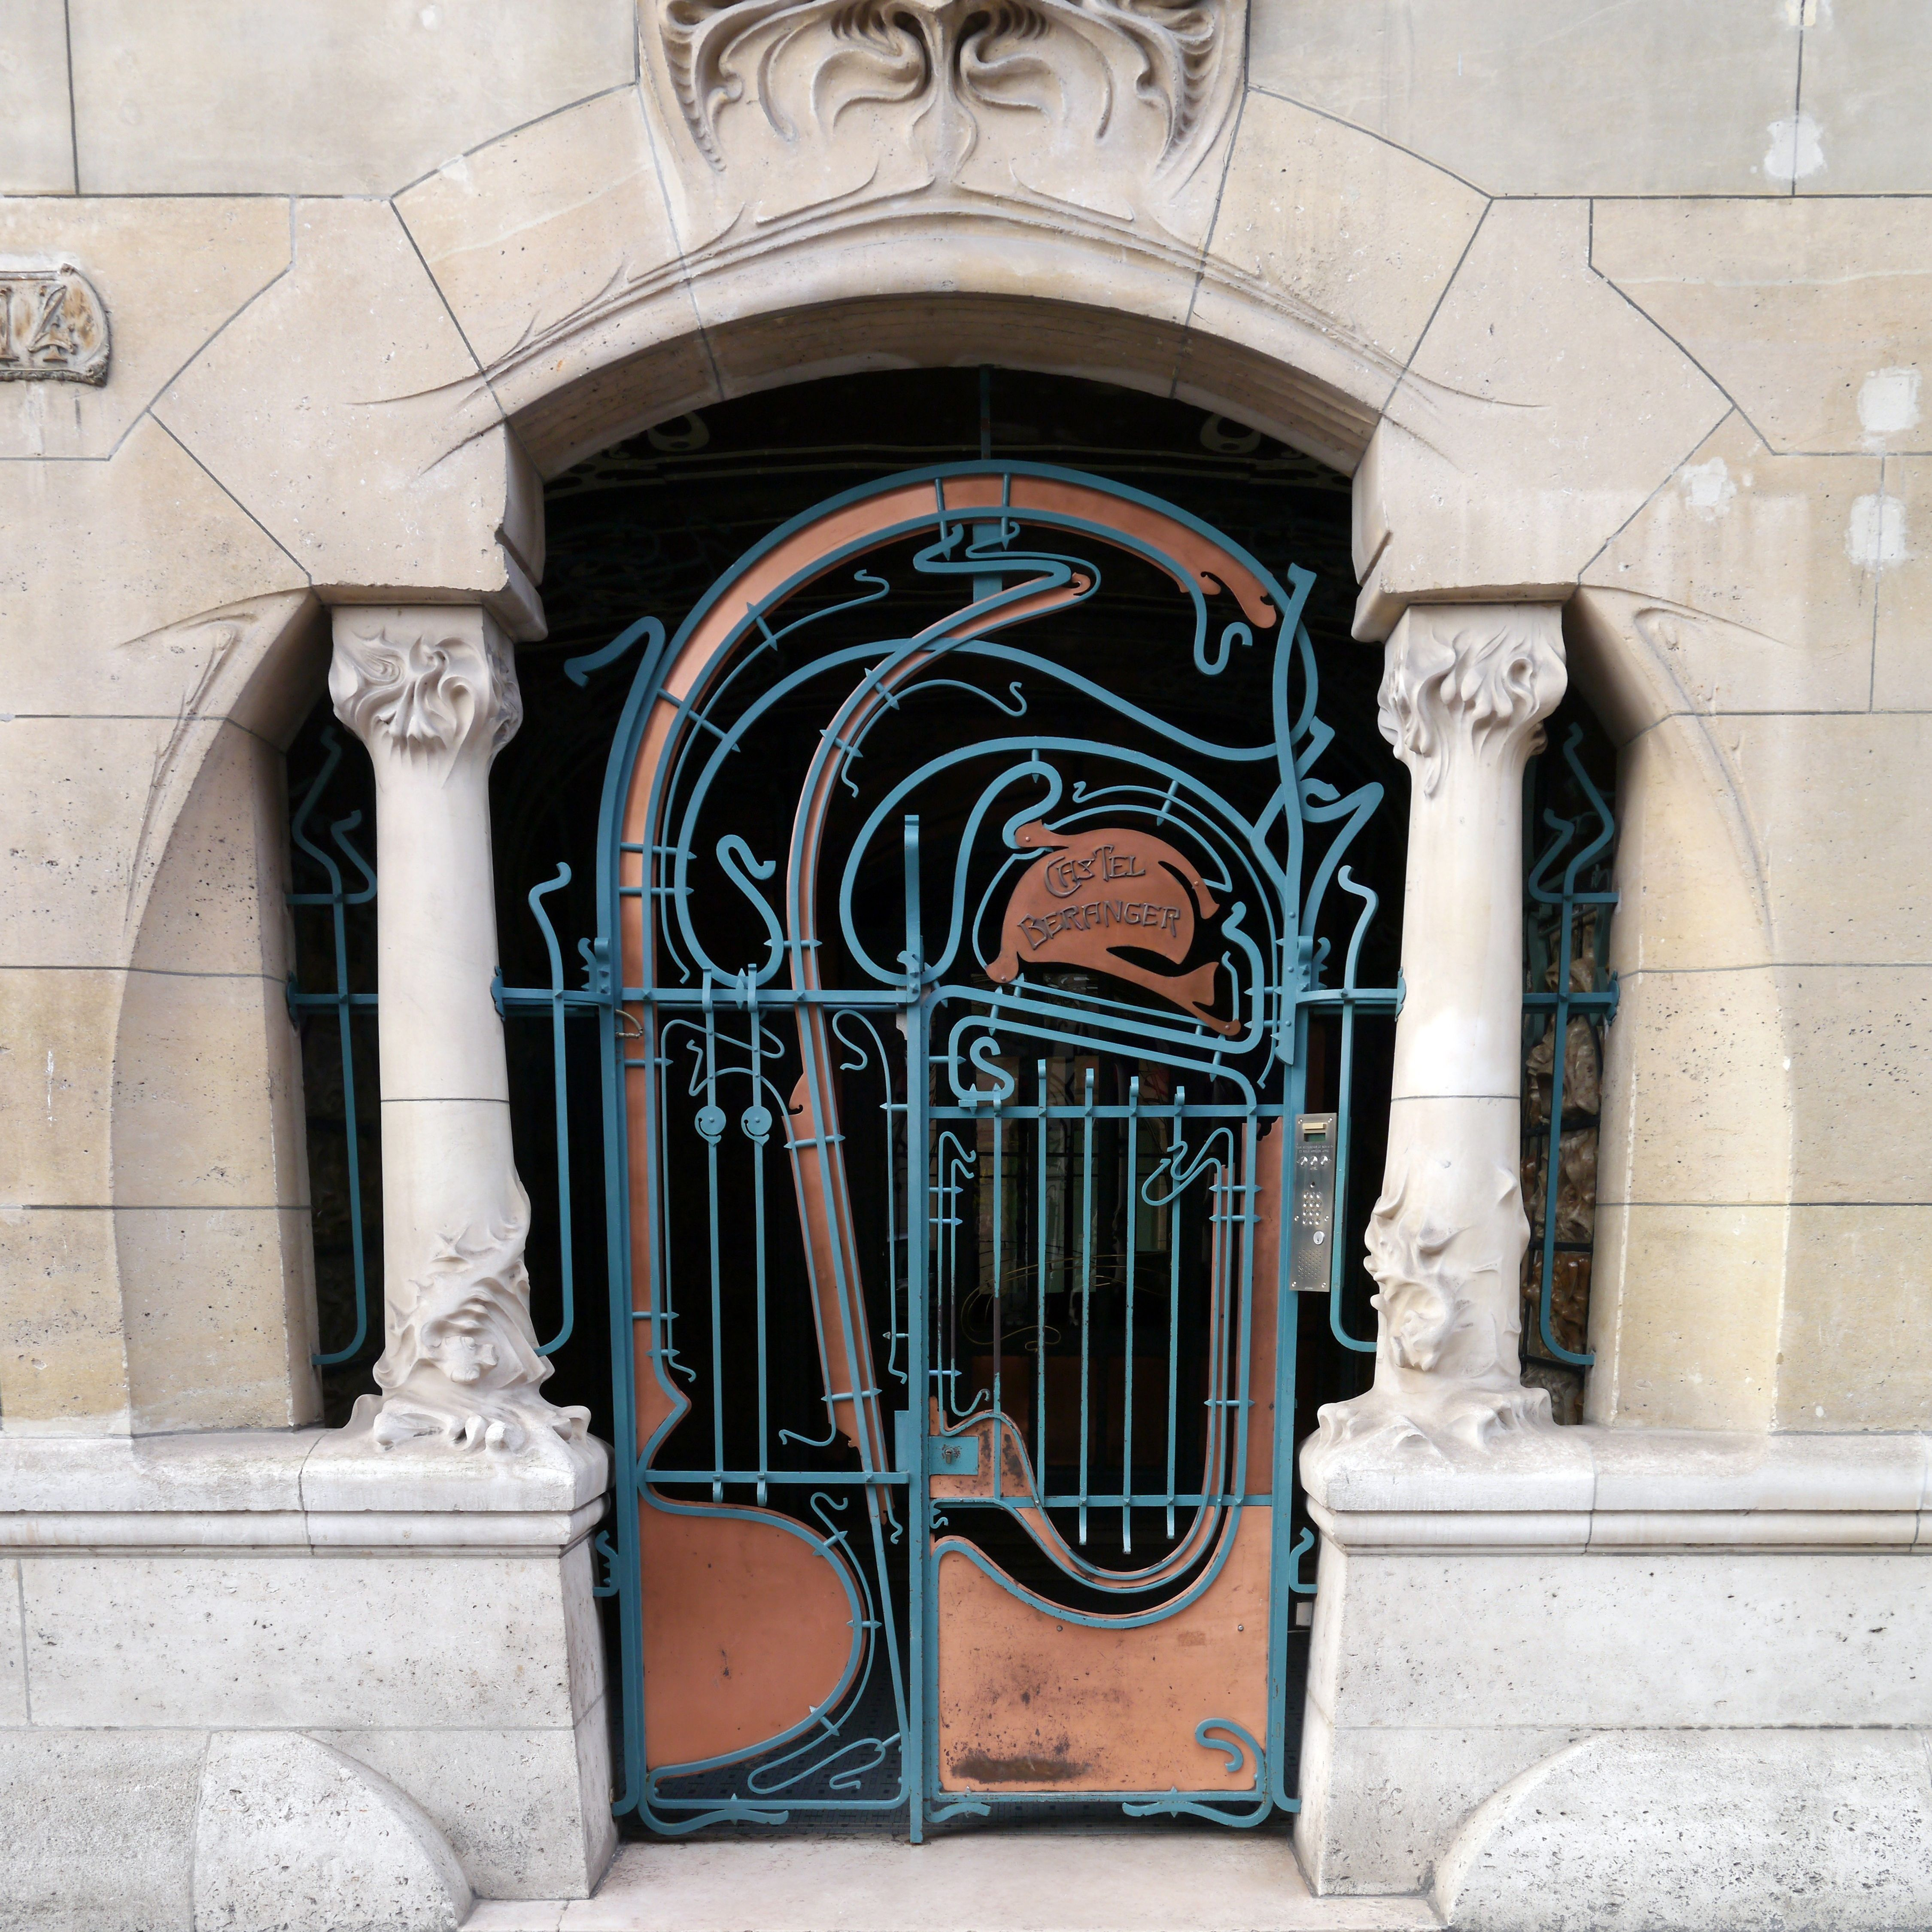 Gateway of the Castel Beranger by Hector Guimard (189598